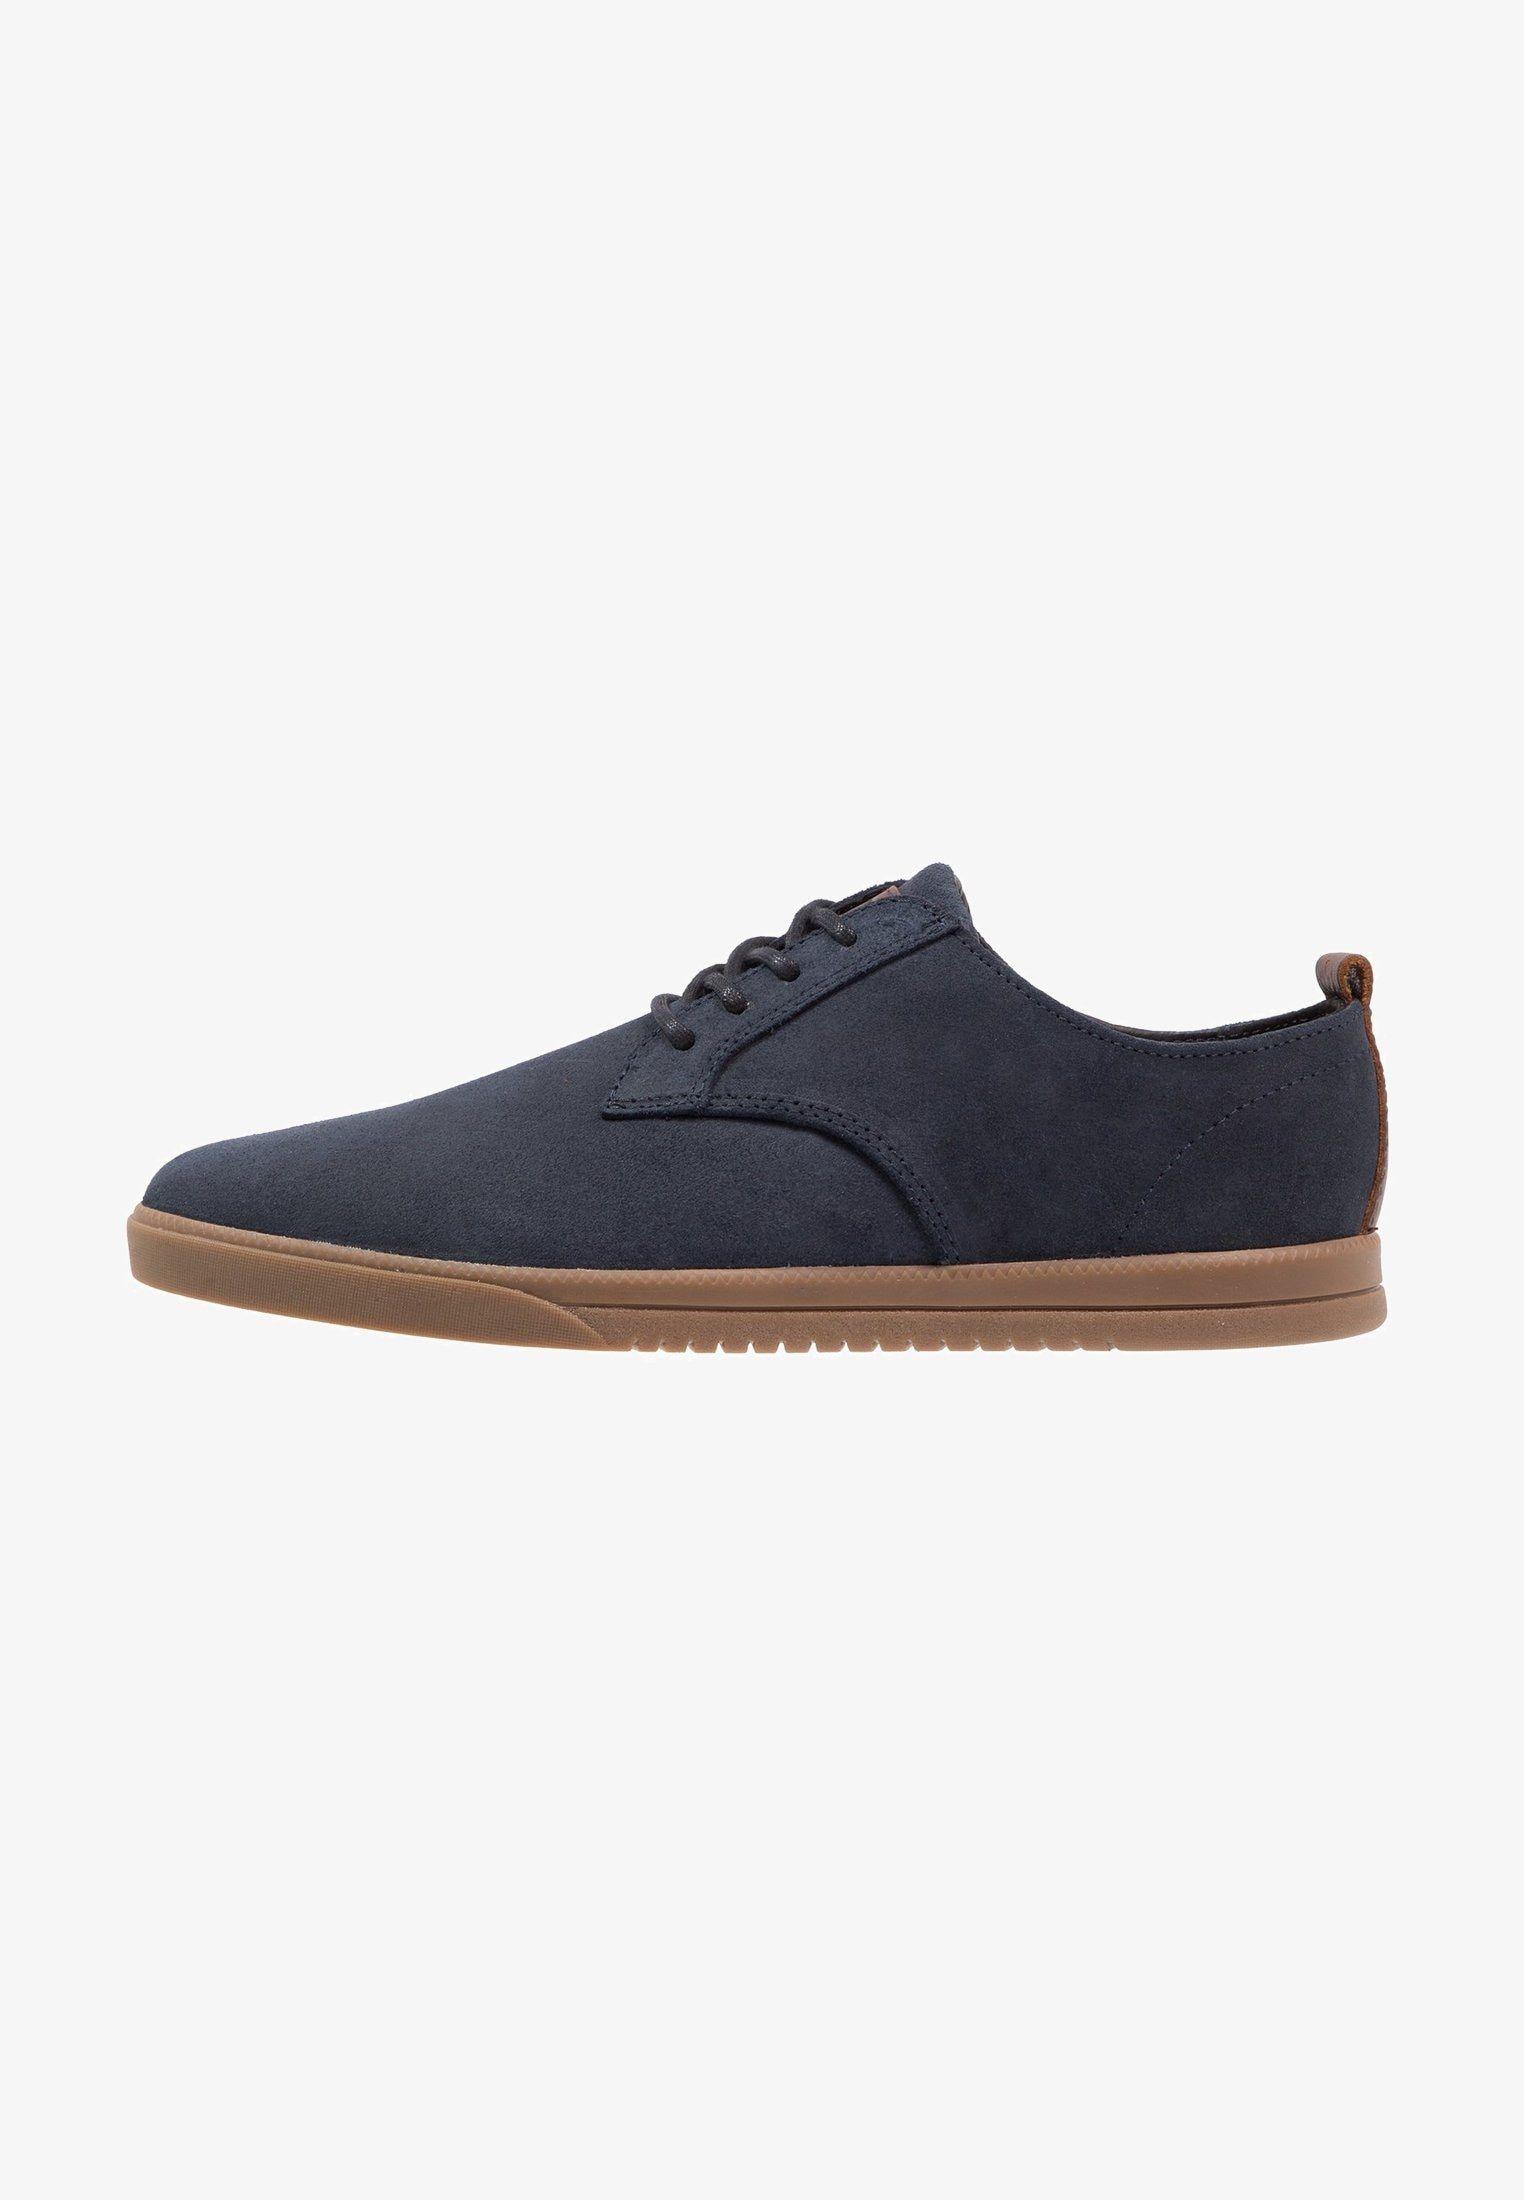 Pinterest Ellington Deep Laag Donkerblauw Navy Rolord Sneakers wx1HX1qRp